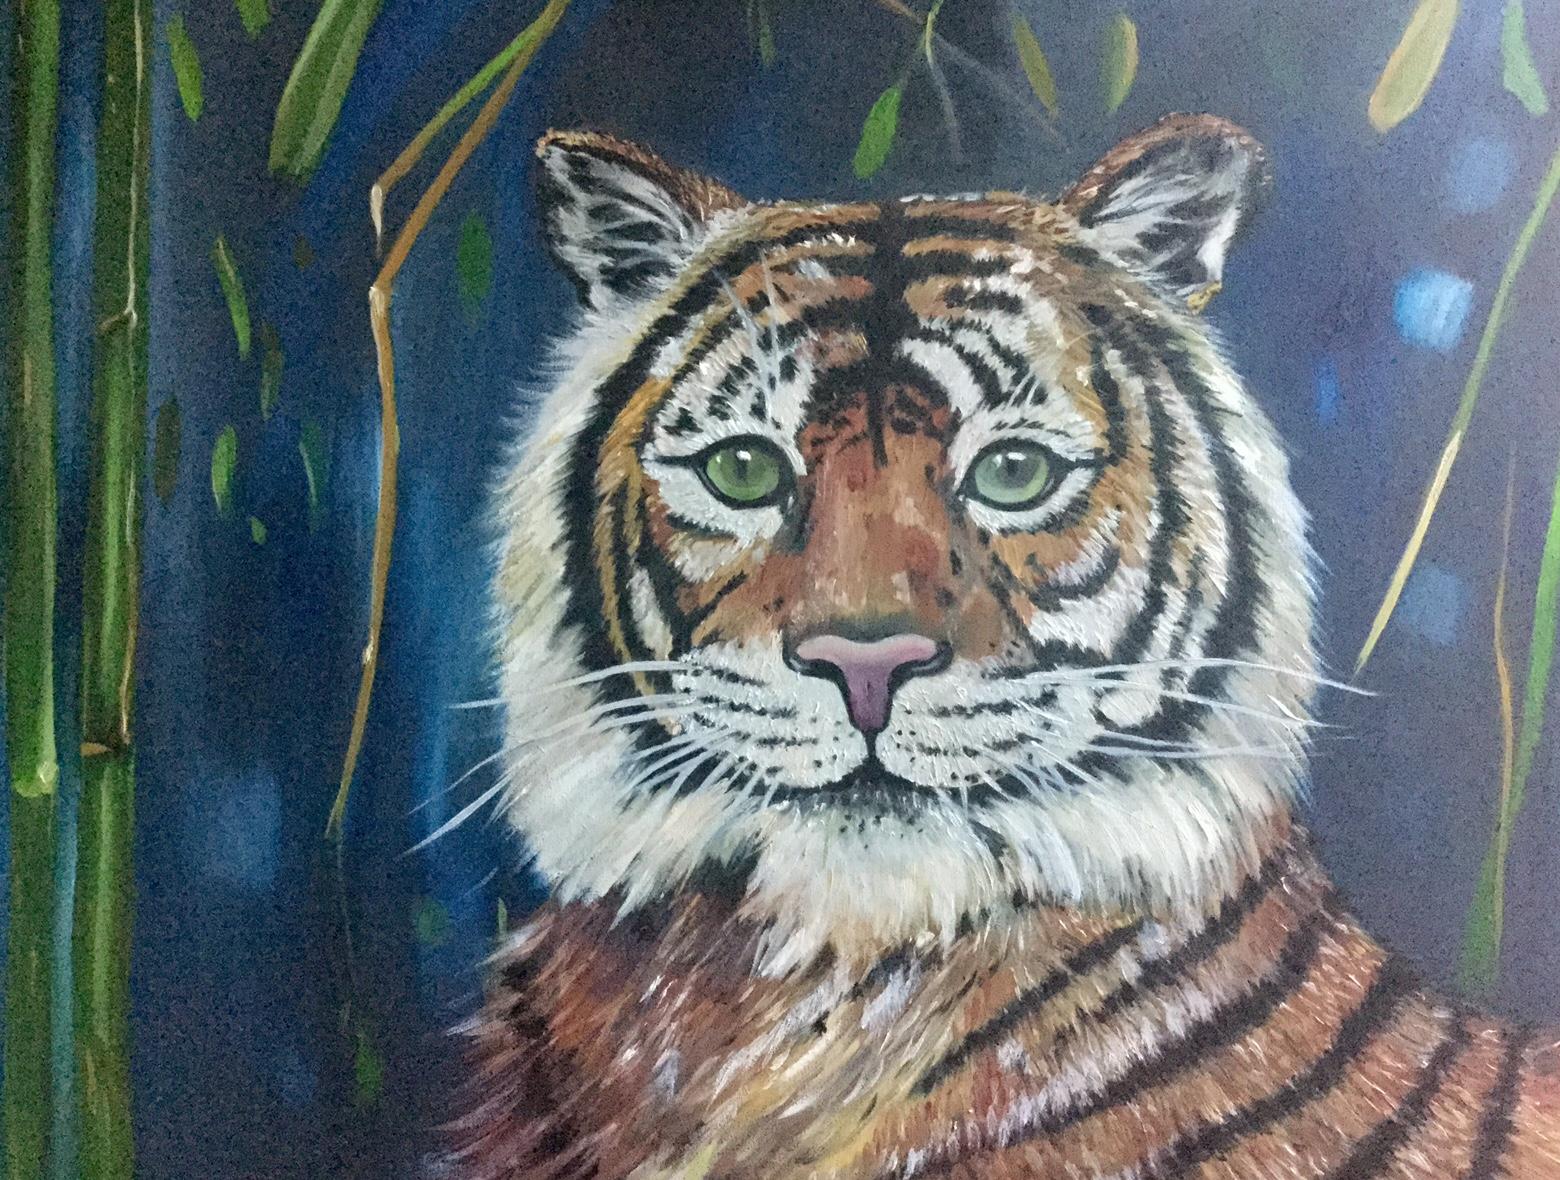 Tiger2 gallery image